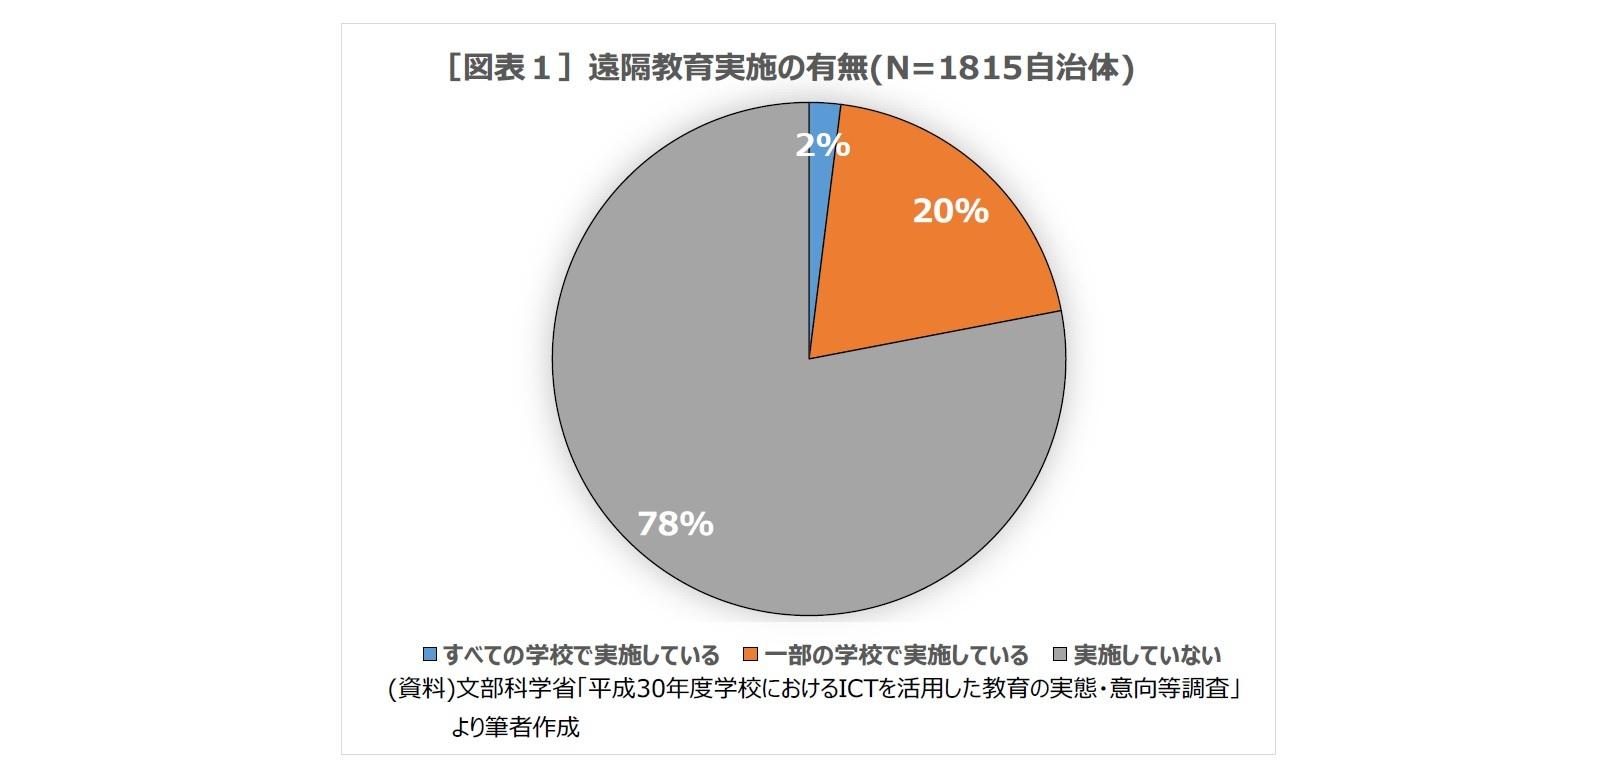 [図表1]遠隔教育実施の有無(N=1815自治体)